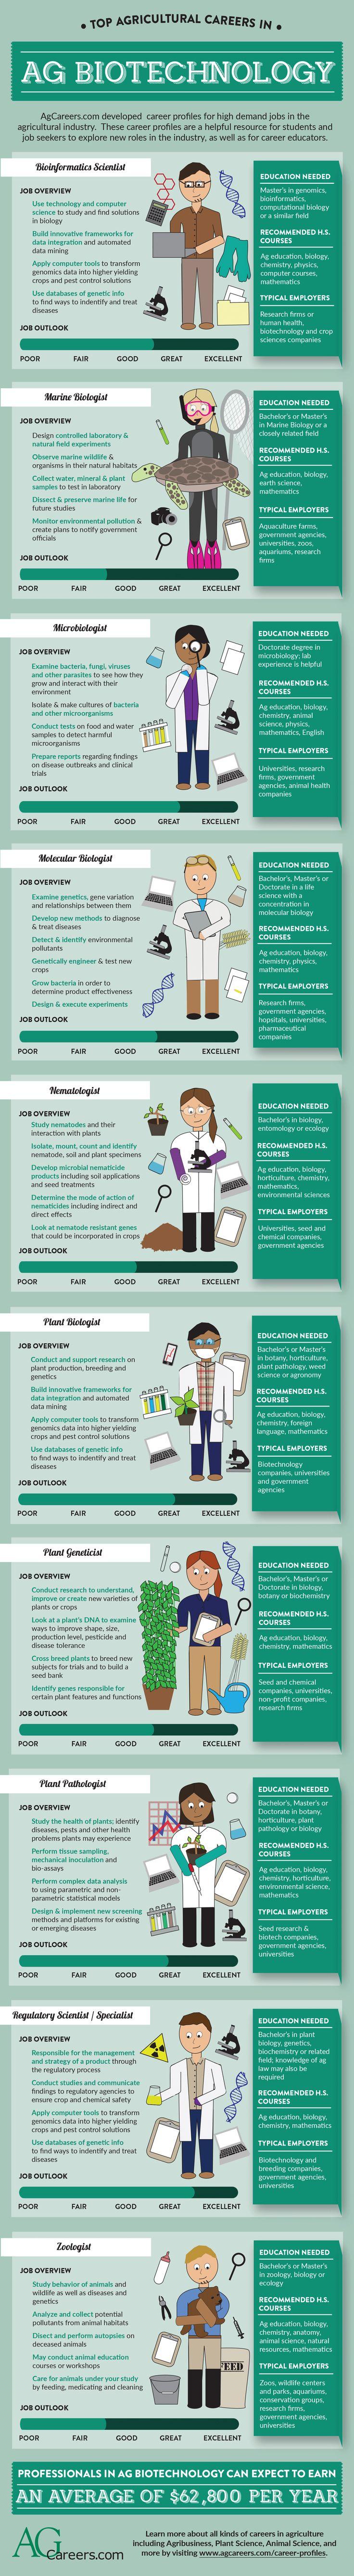 256 best My Dream Job images on Pinterest | Career options, Science ...